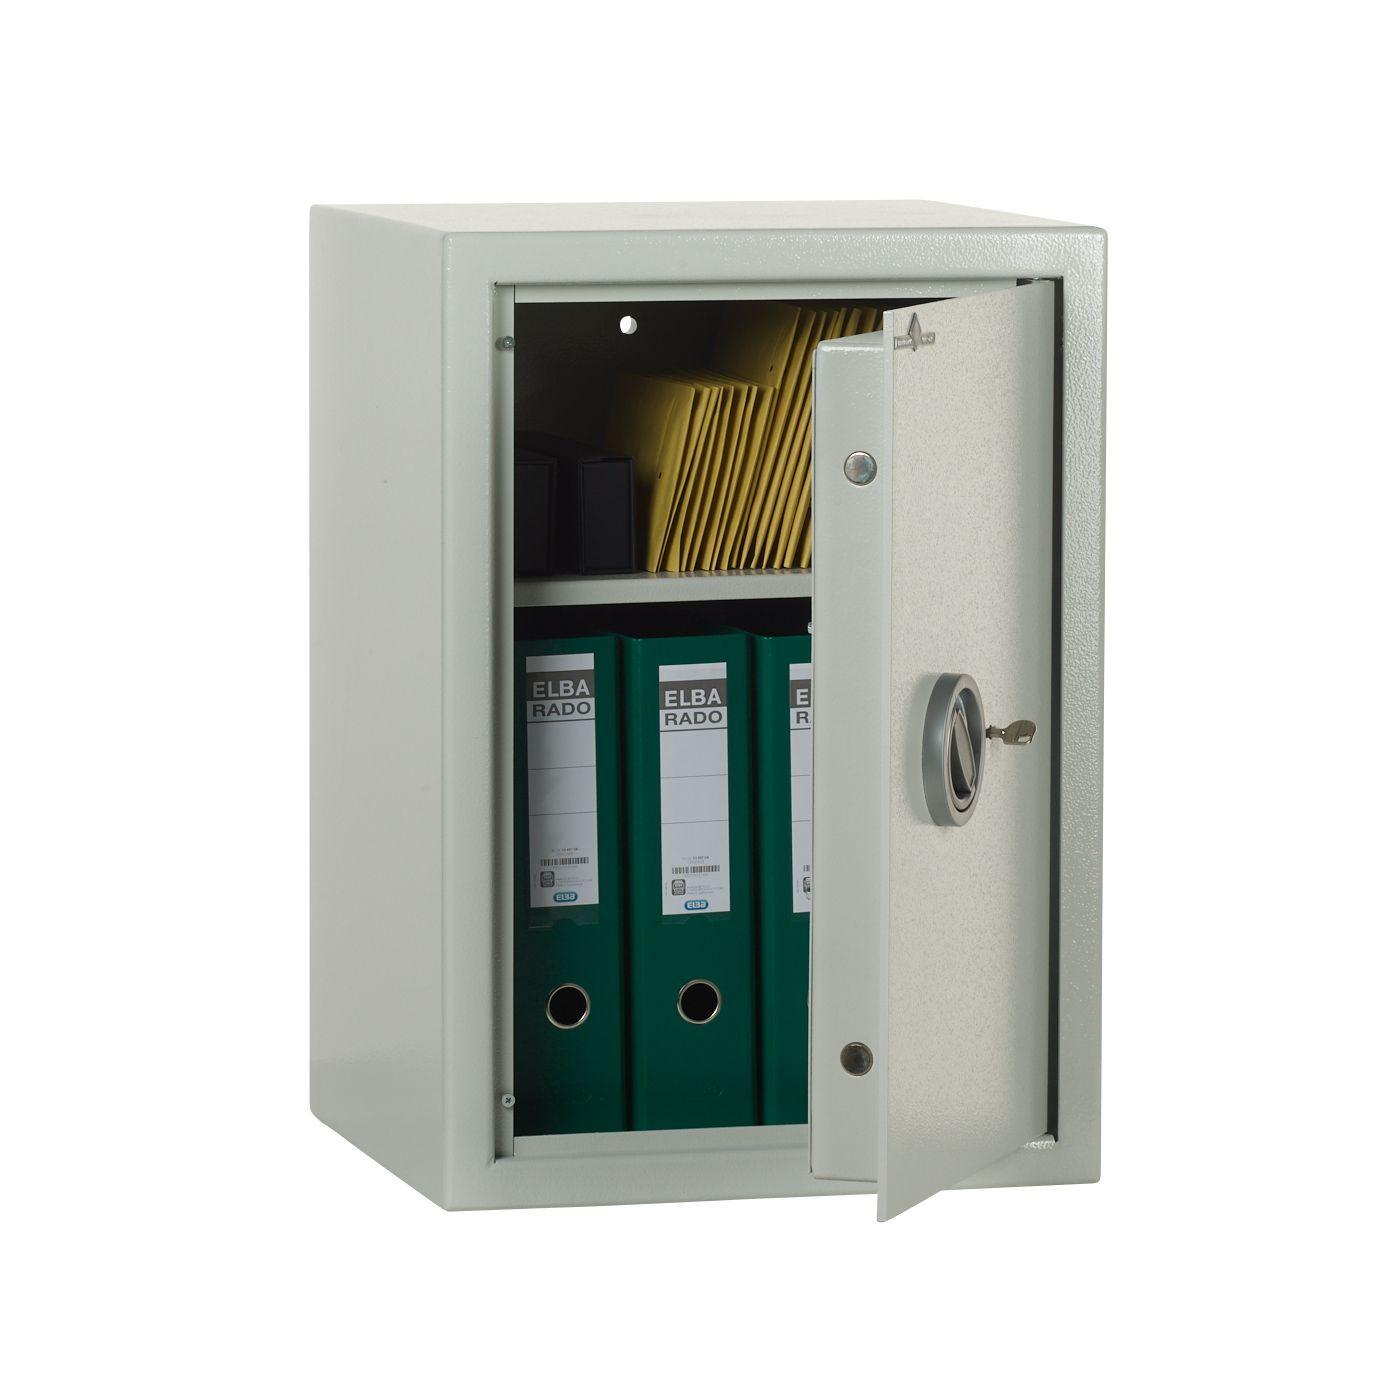 Hpkt 400 03 Small Safe Hartmann Tresore Circuit Breaker